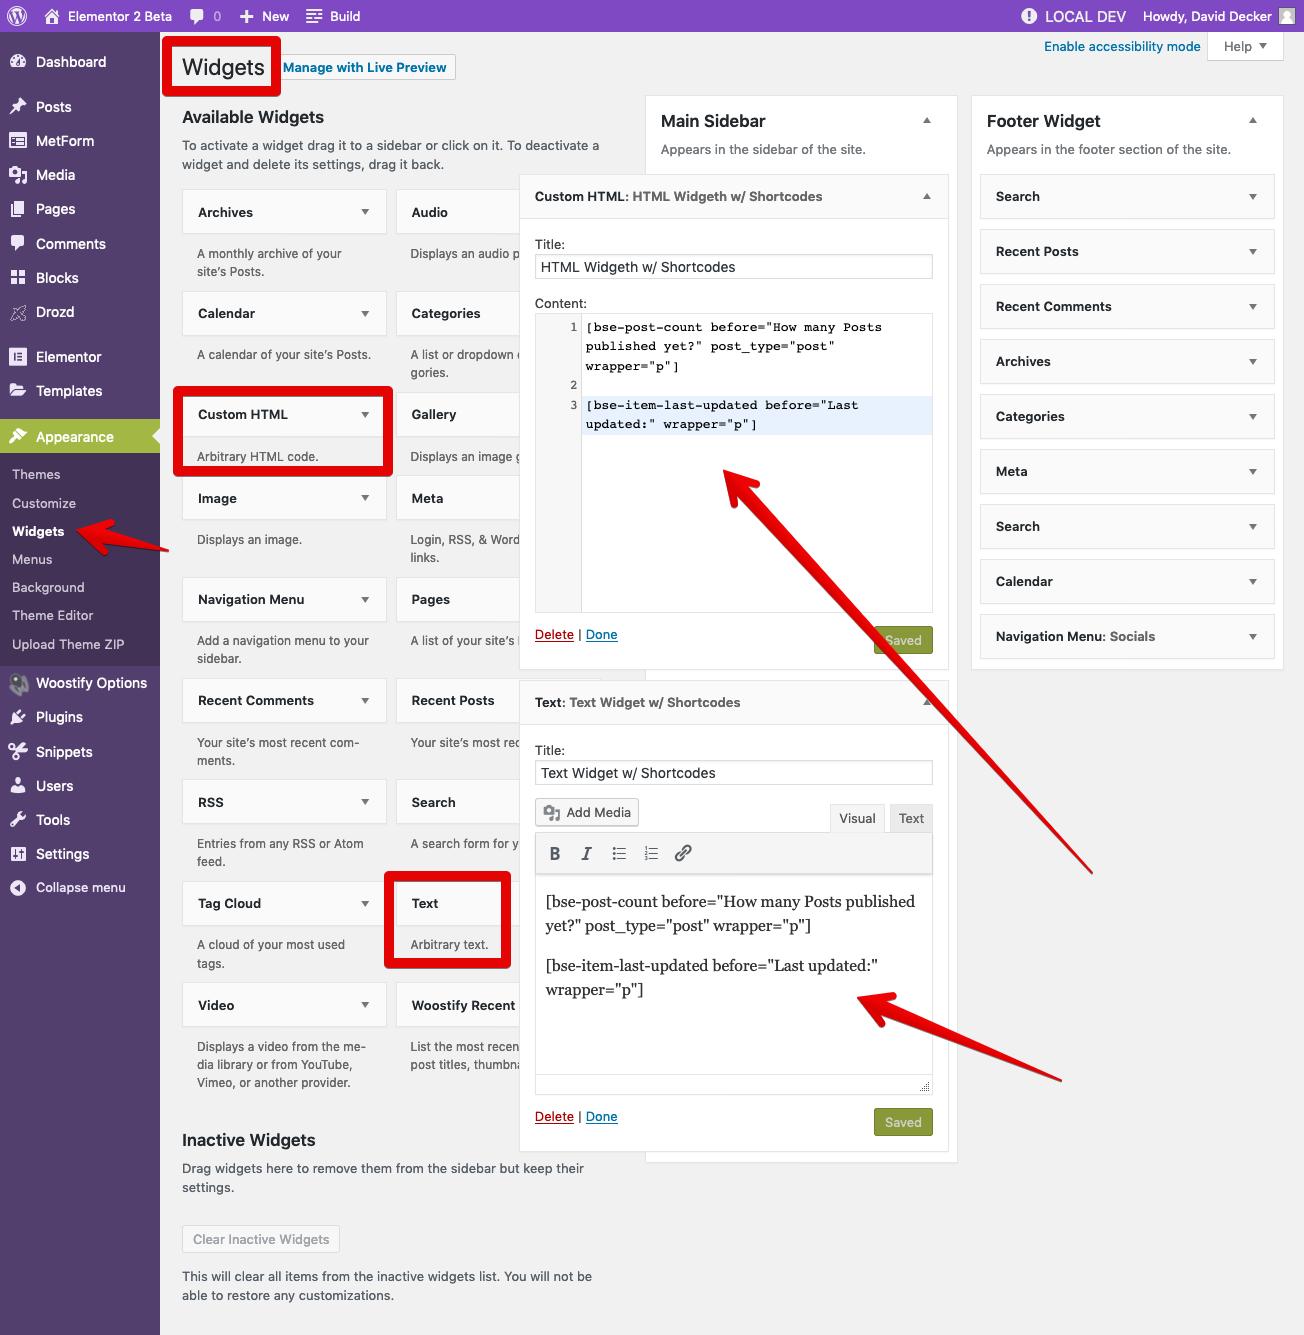 <p>Insert a Shortcode into Text Widget or Custom HTML Widget</p>